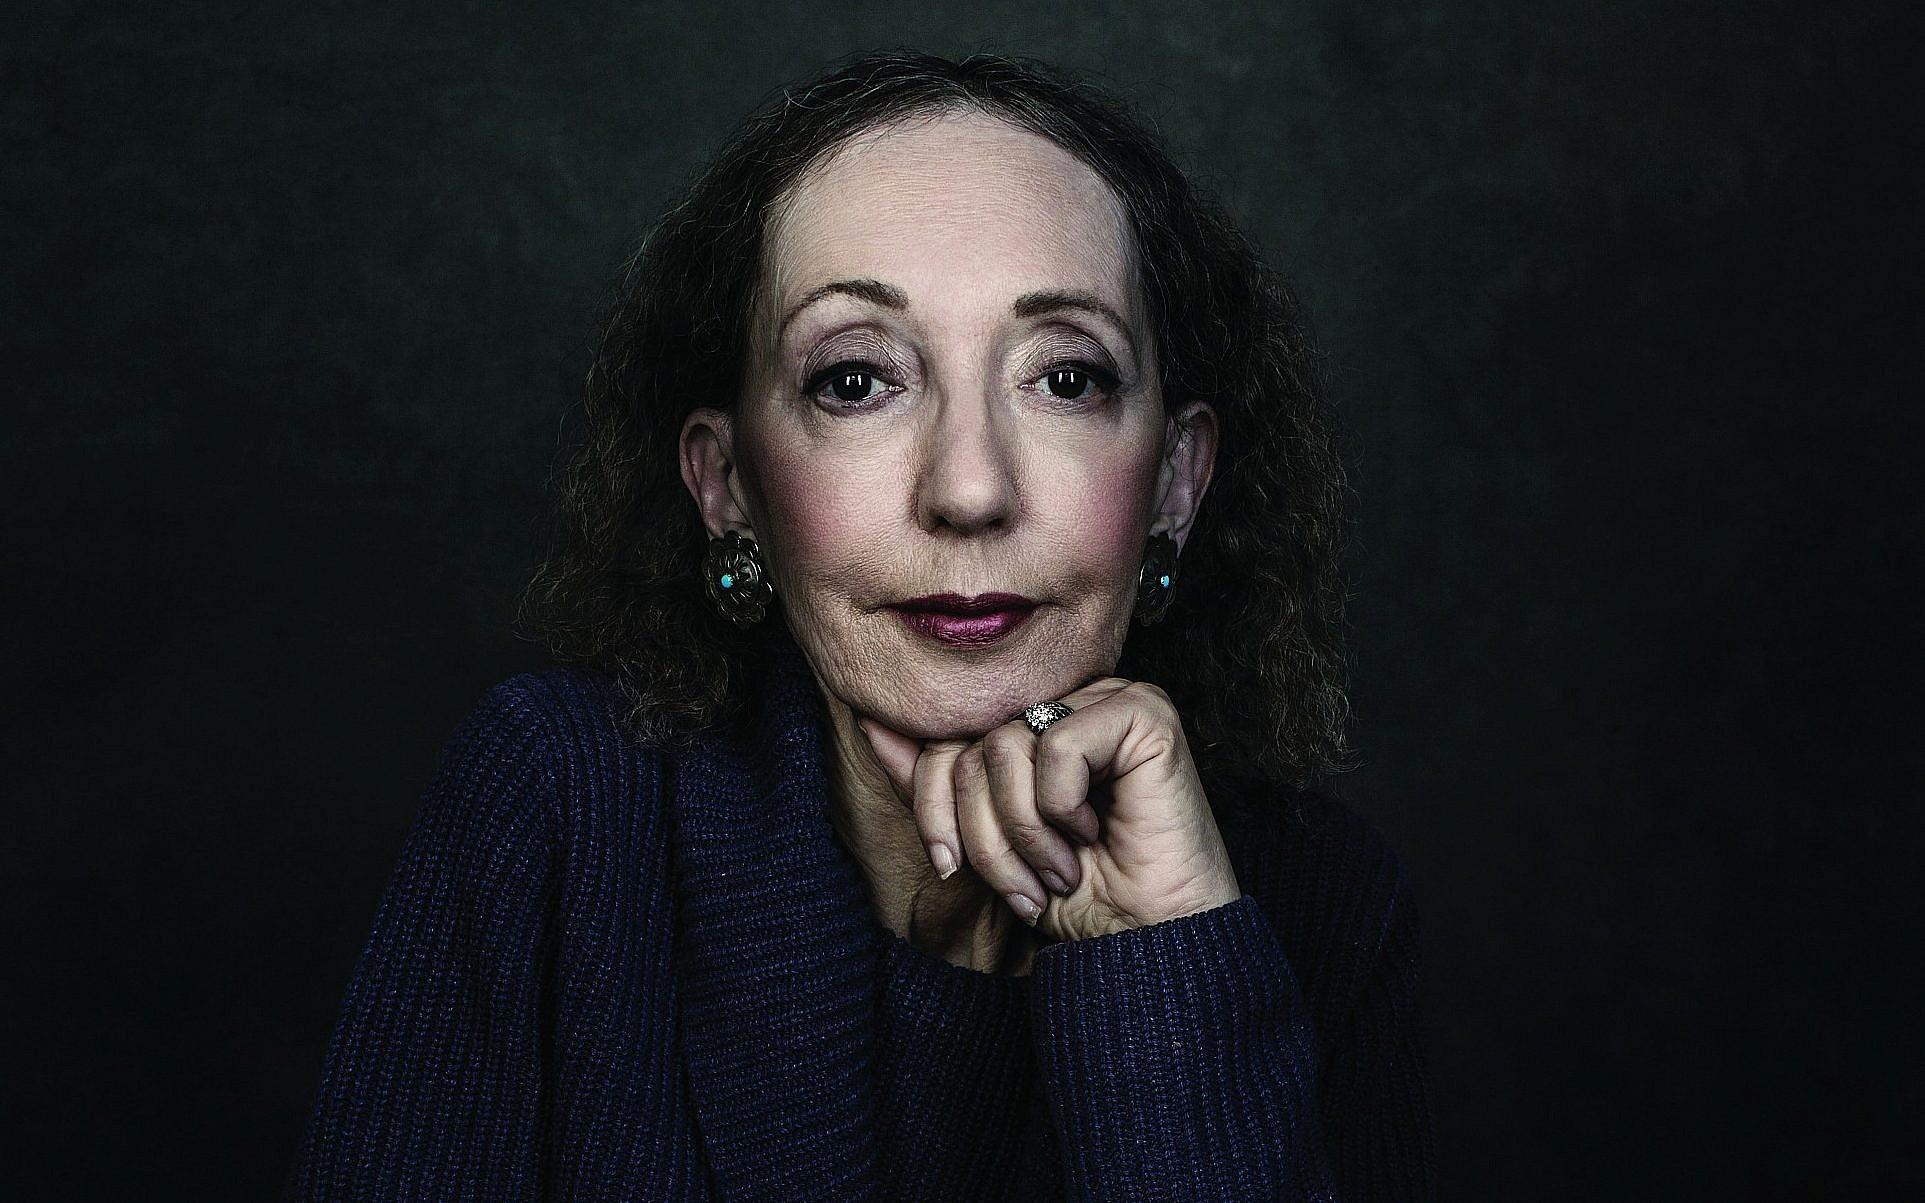 On first Israel visit, Joyce Carol Oates laments family's denial of